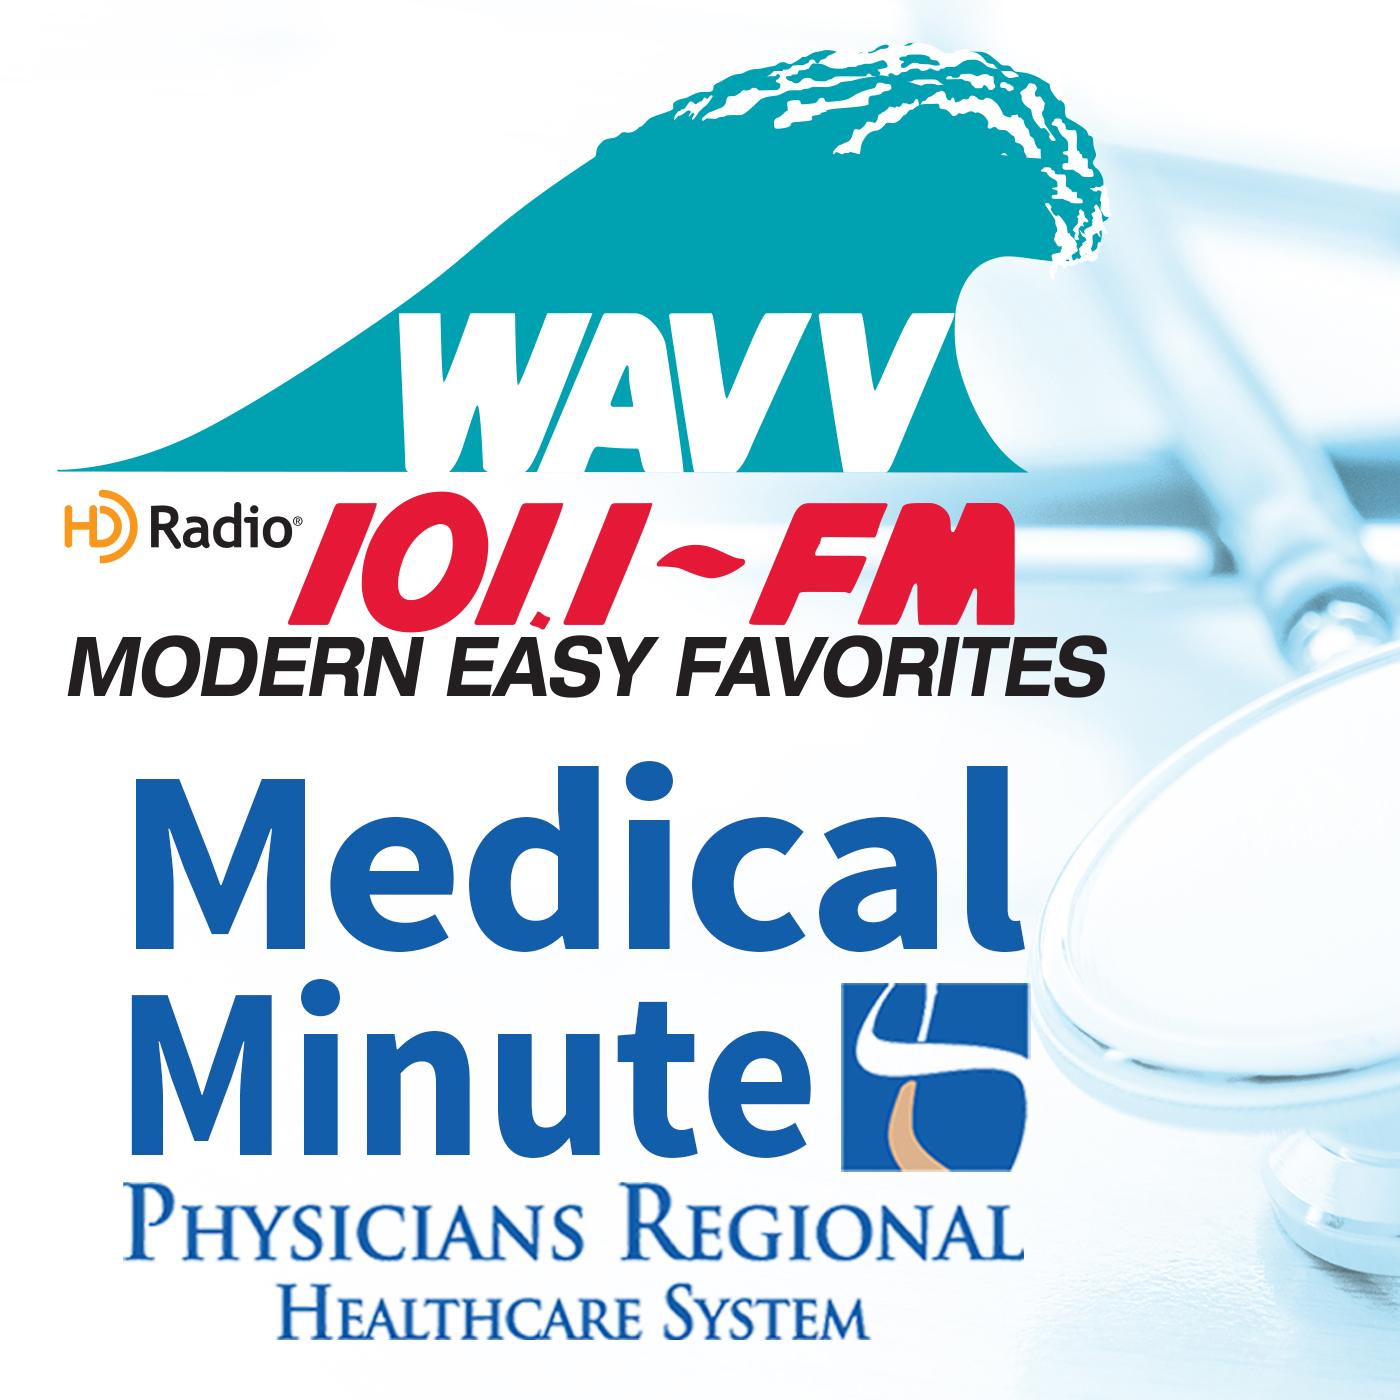 WAVV 101 - Medical Minute show art